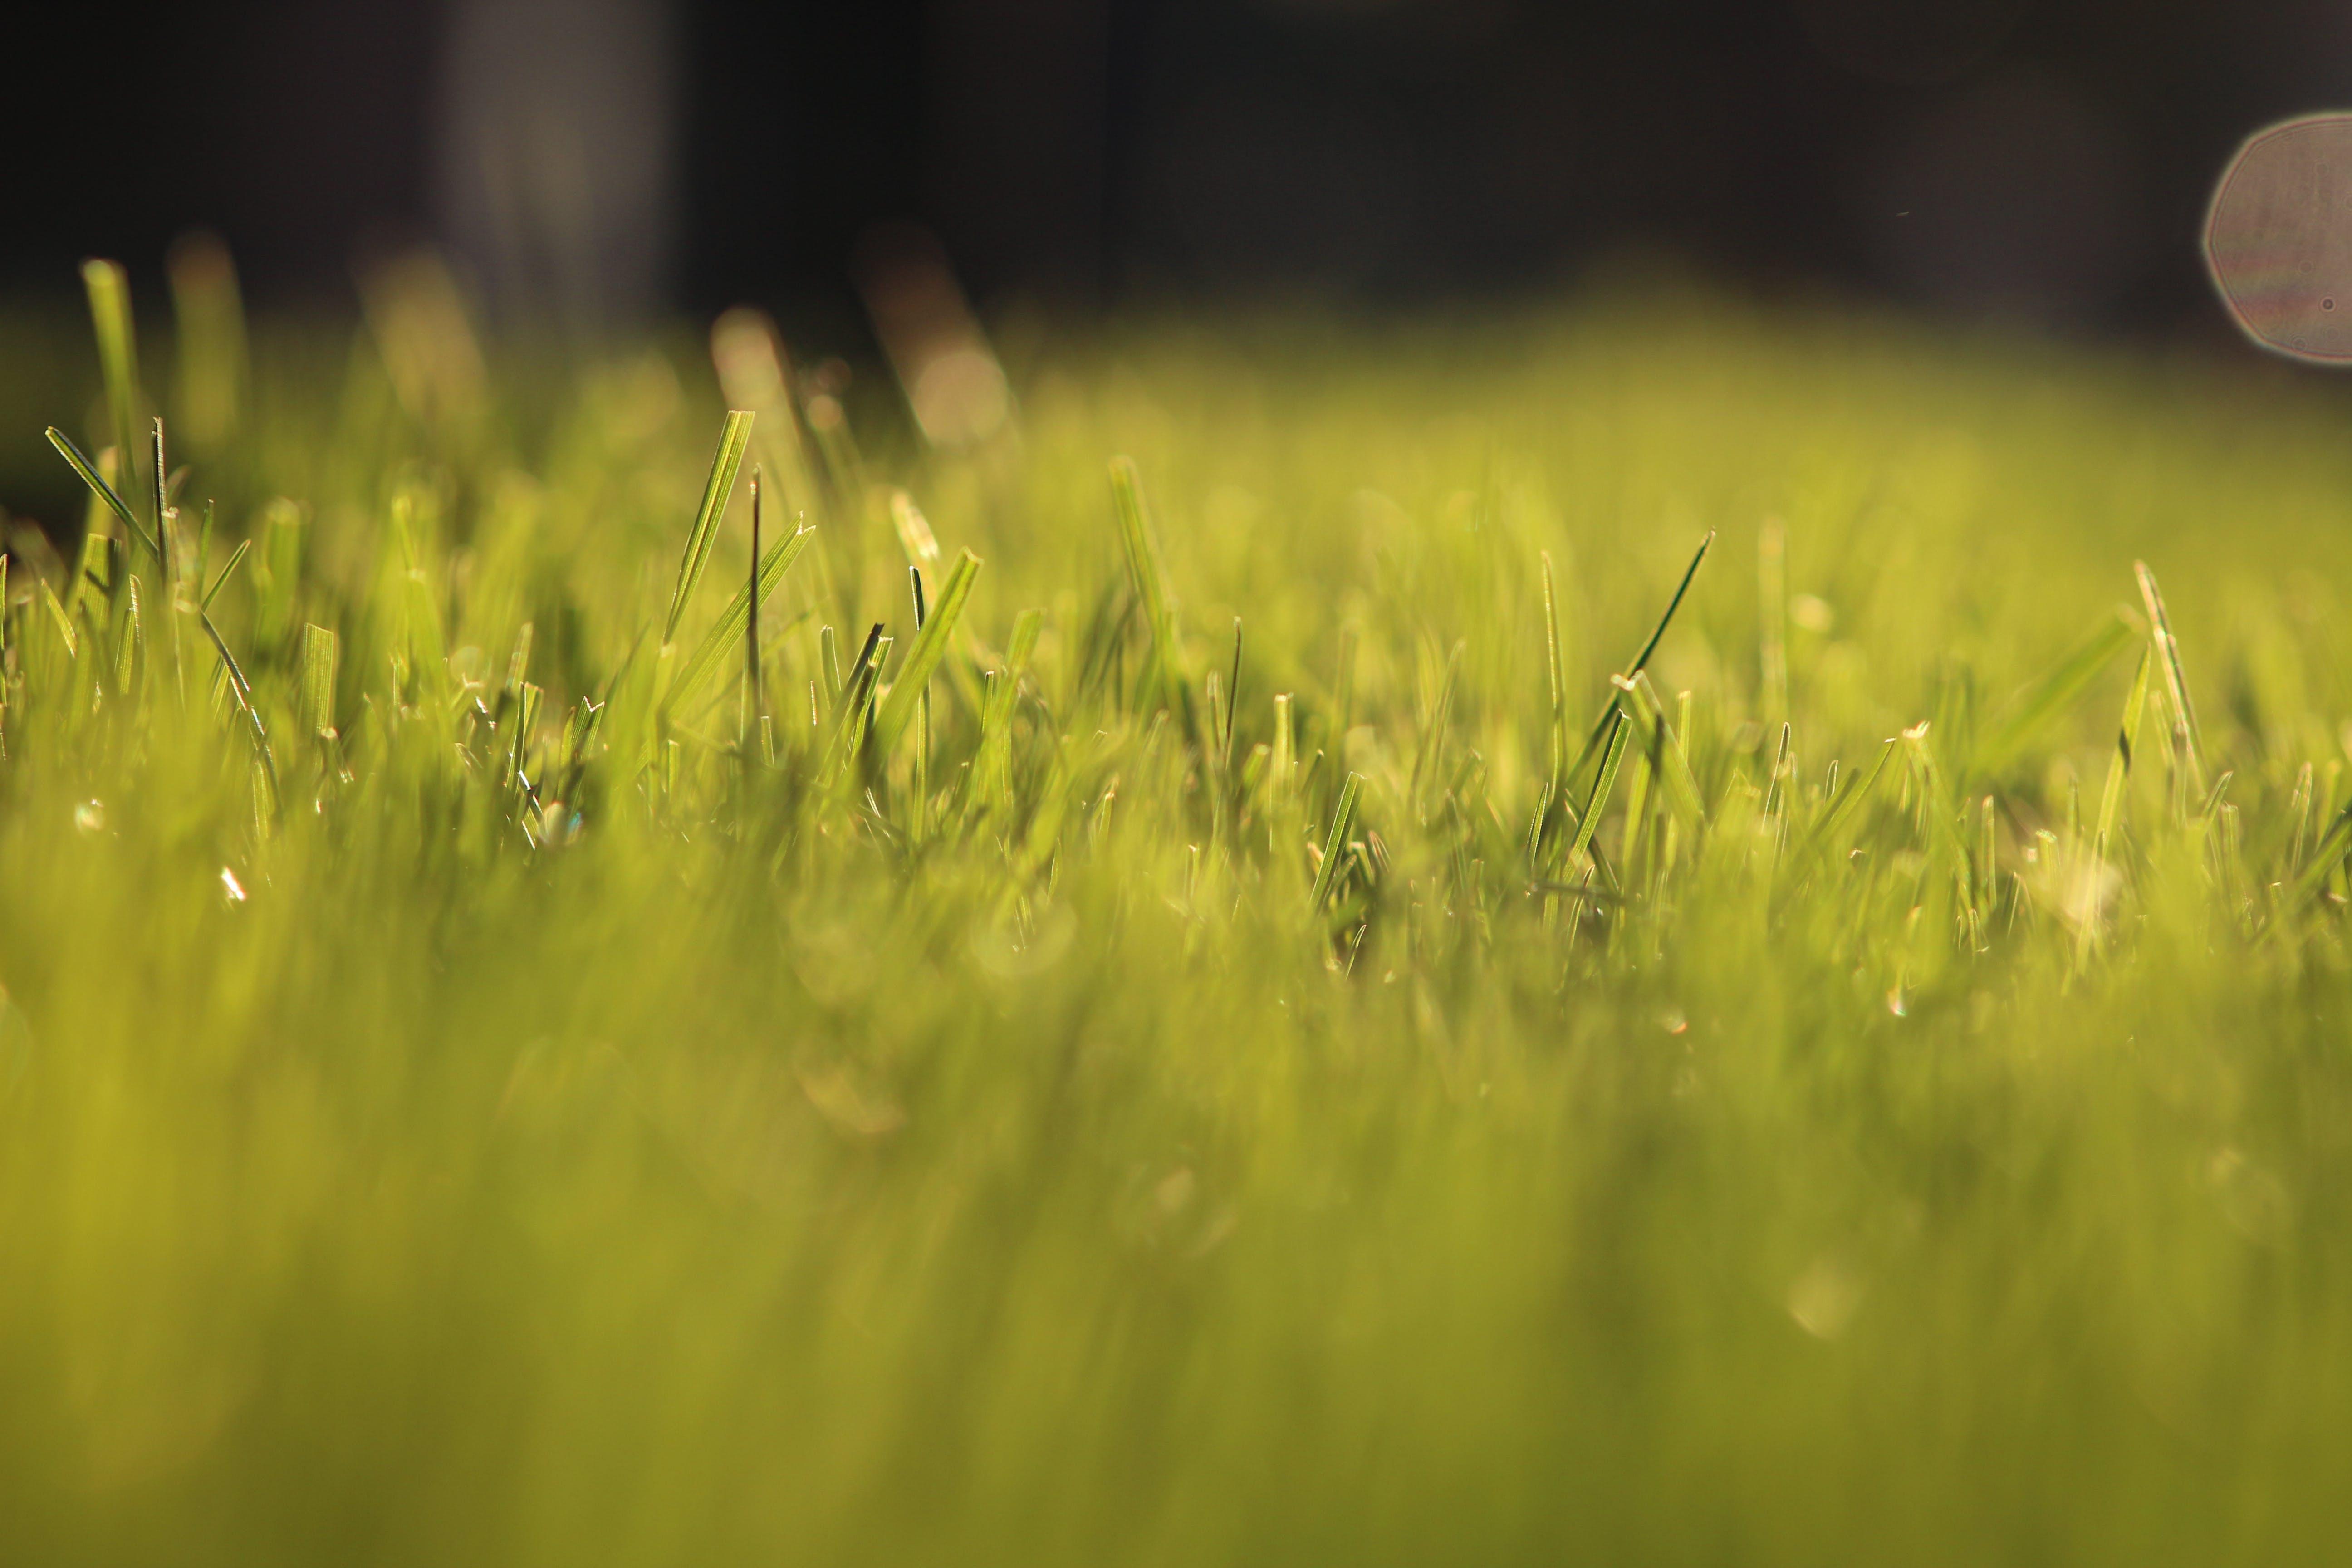 Free stock photo of grass, blade of grass, grass land, dry grass